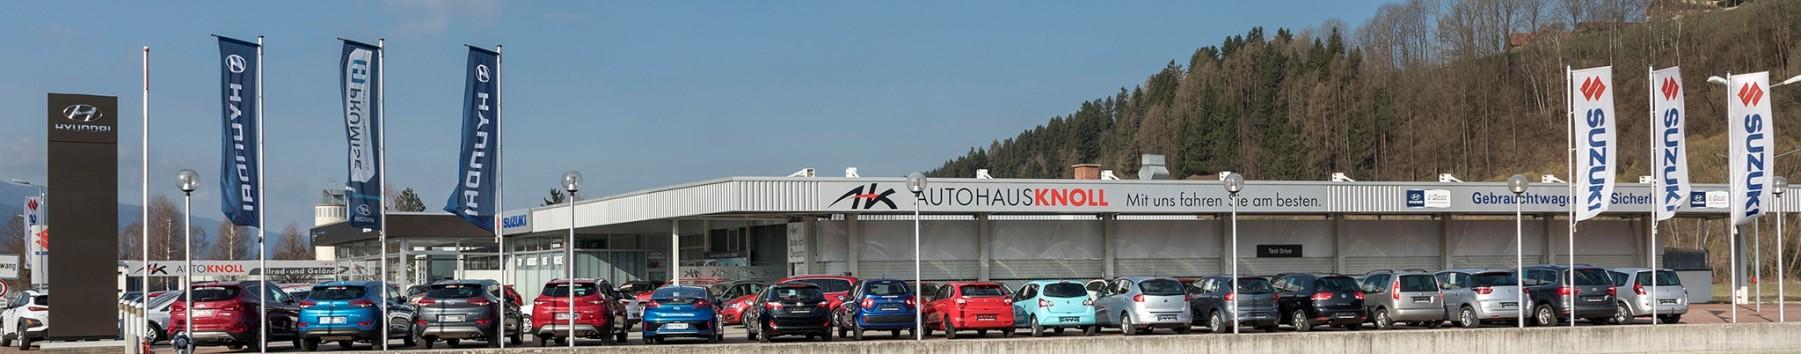 Autohaus Knoll Langenwang